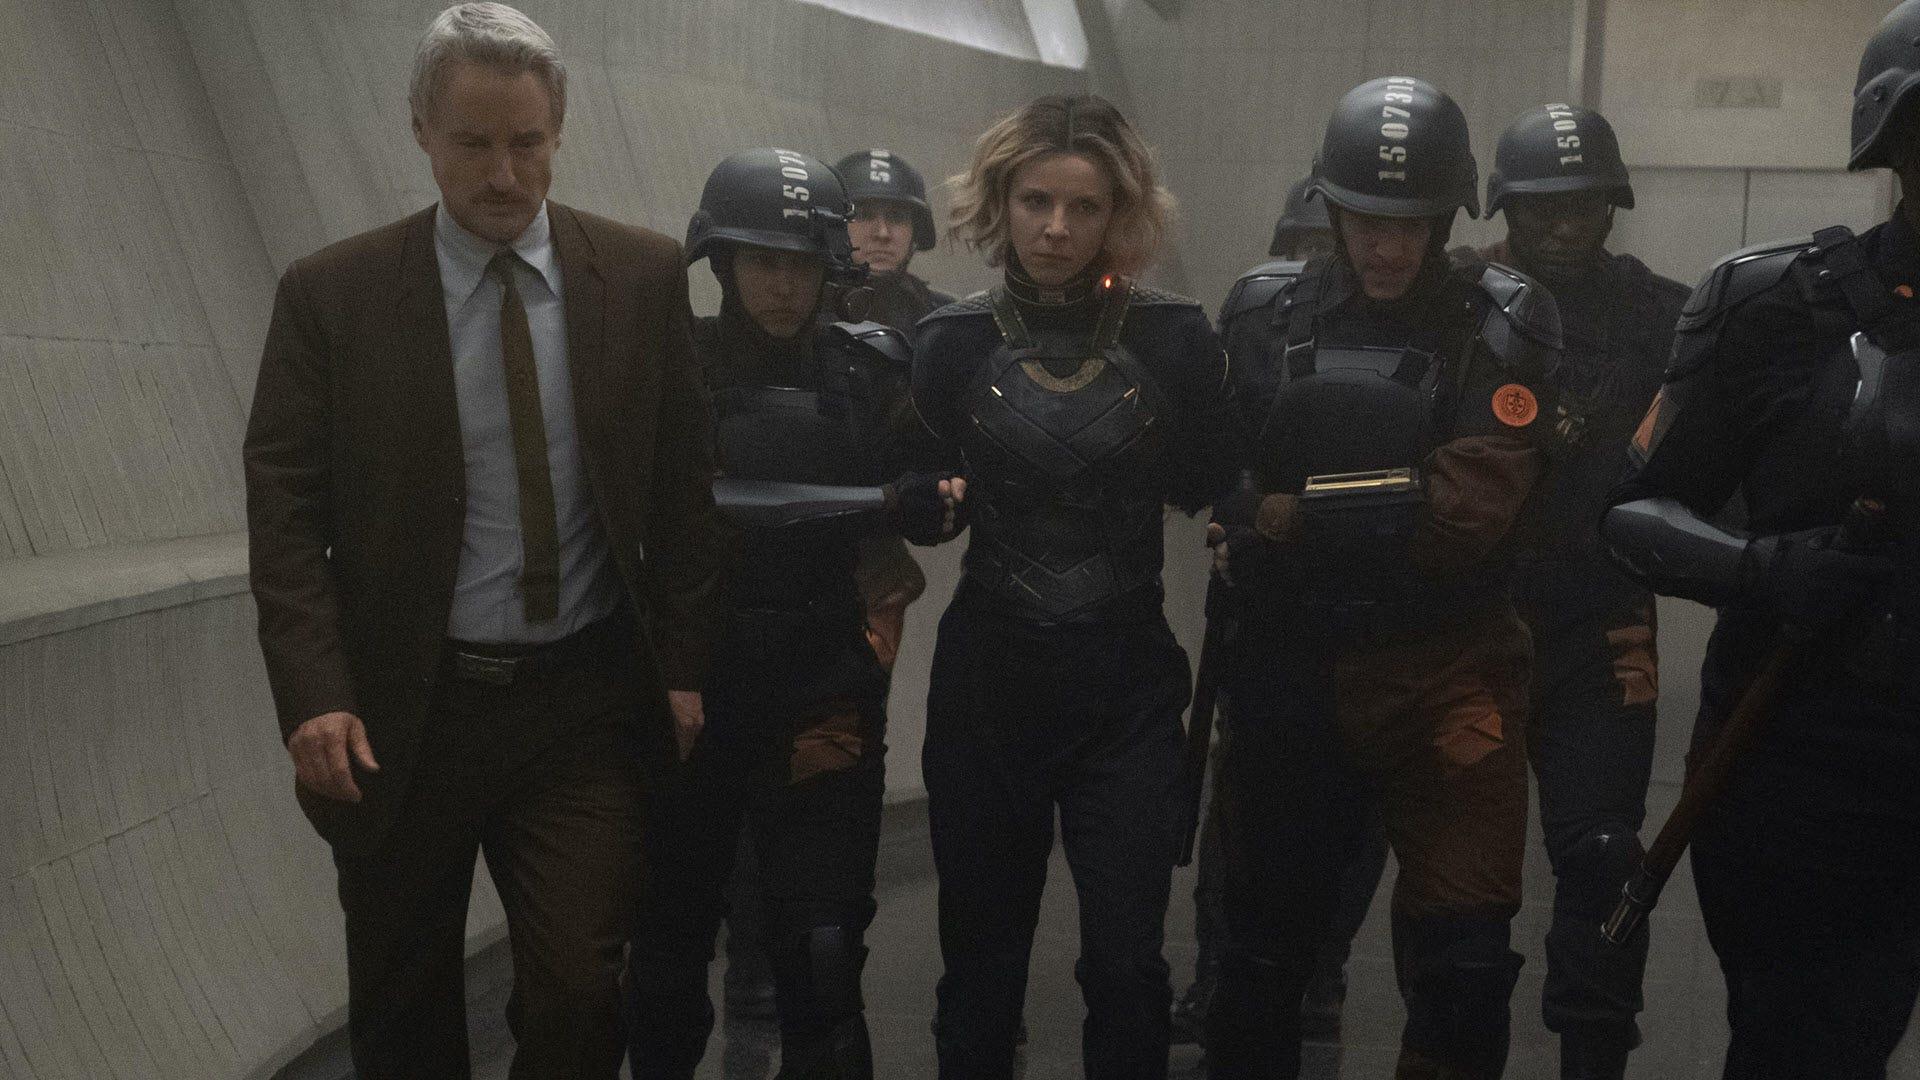 A captured Sylvie is led into a hallway.